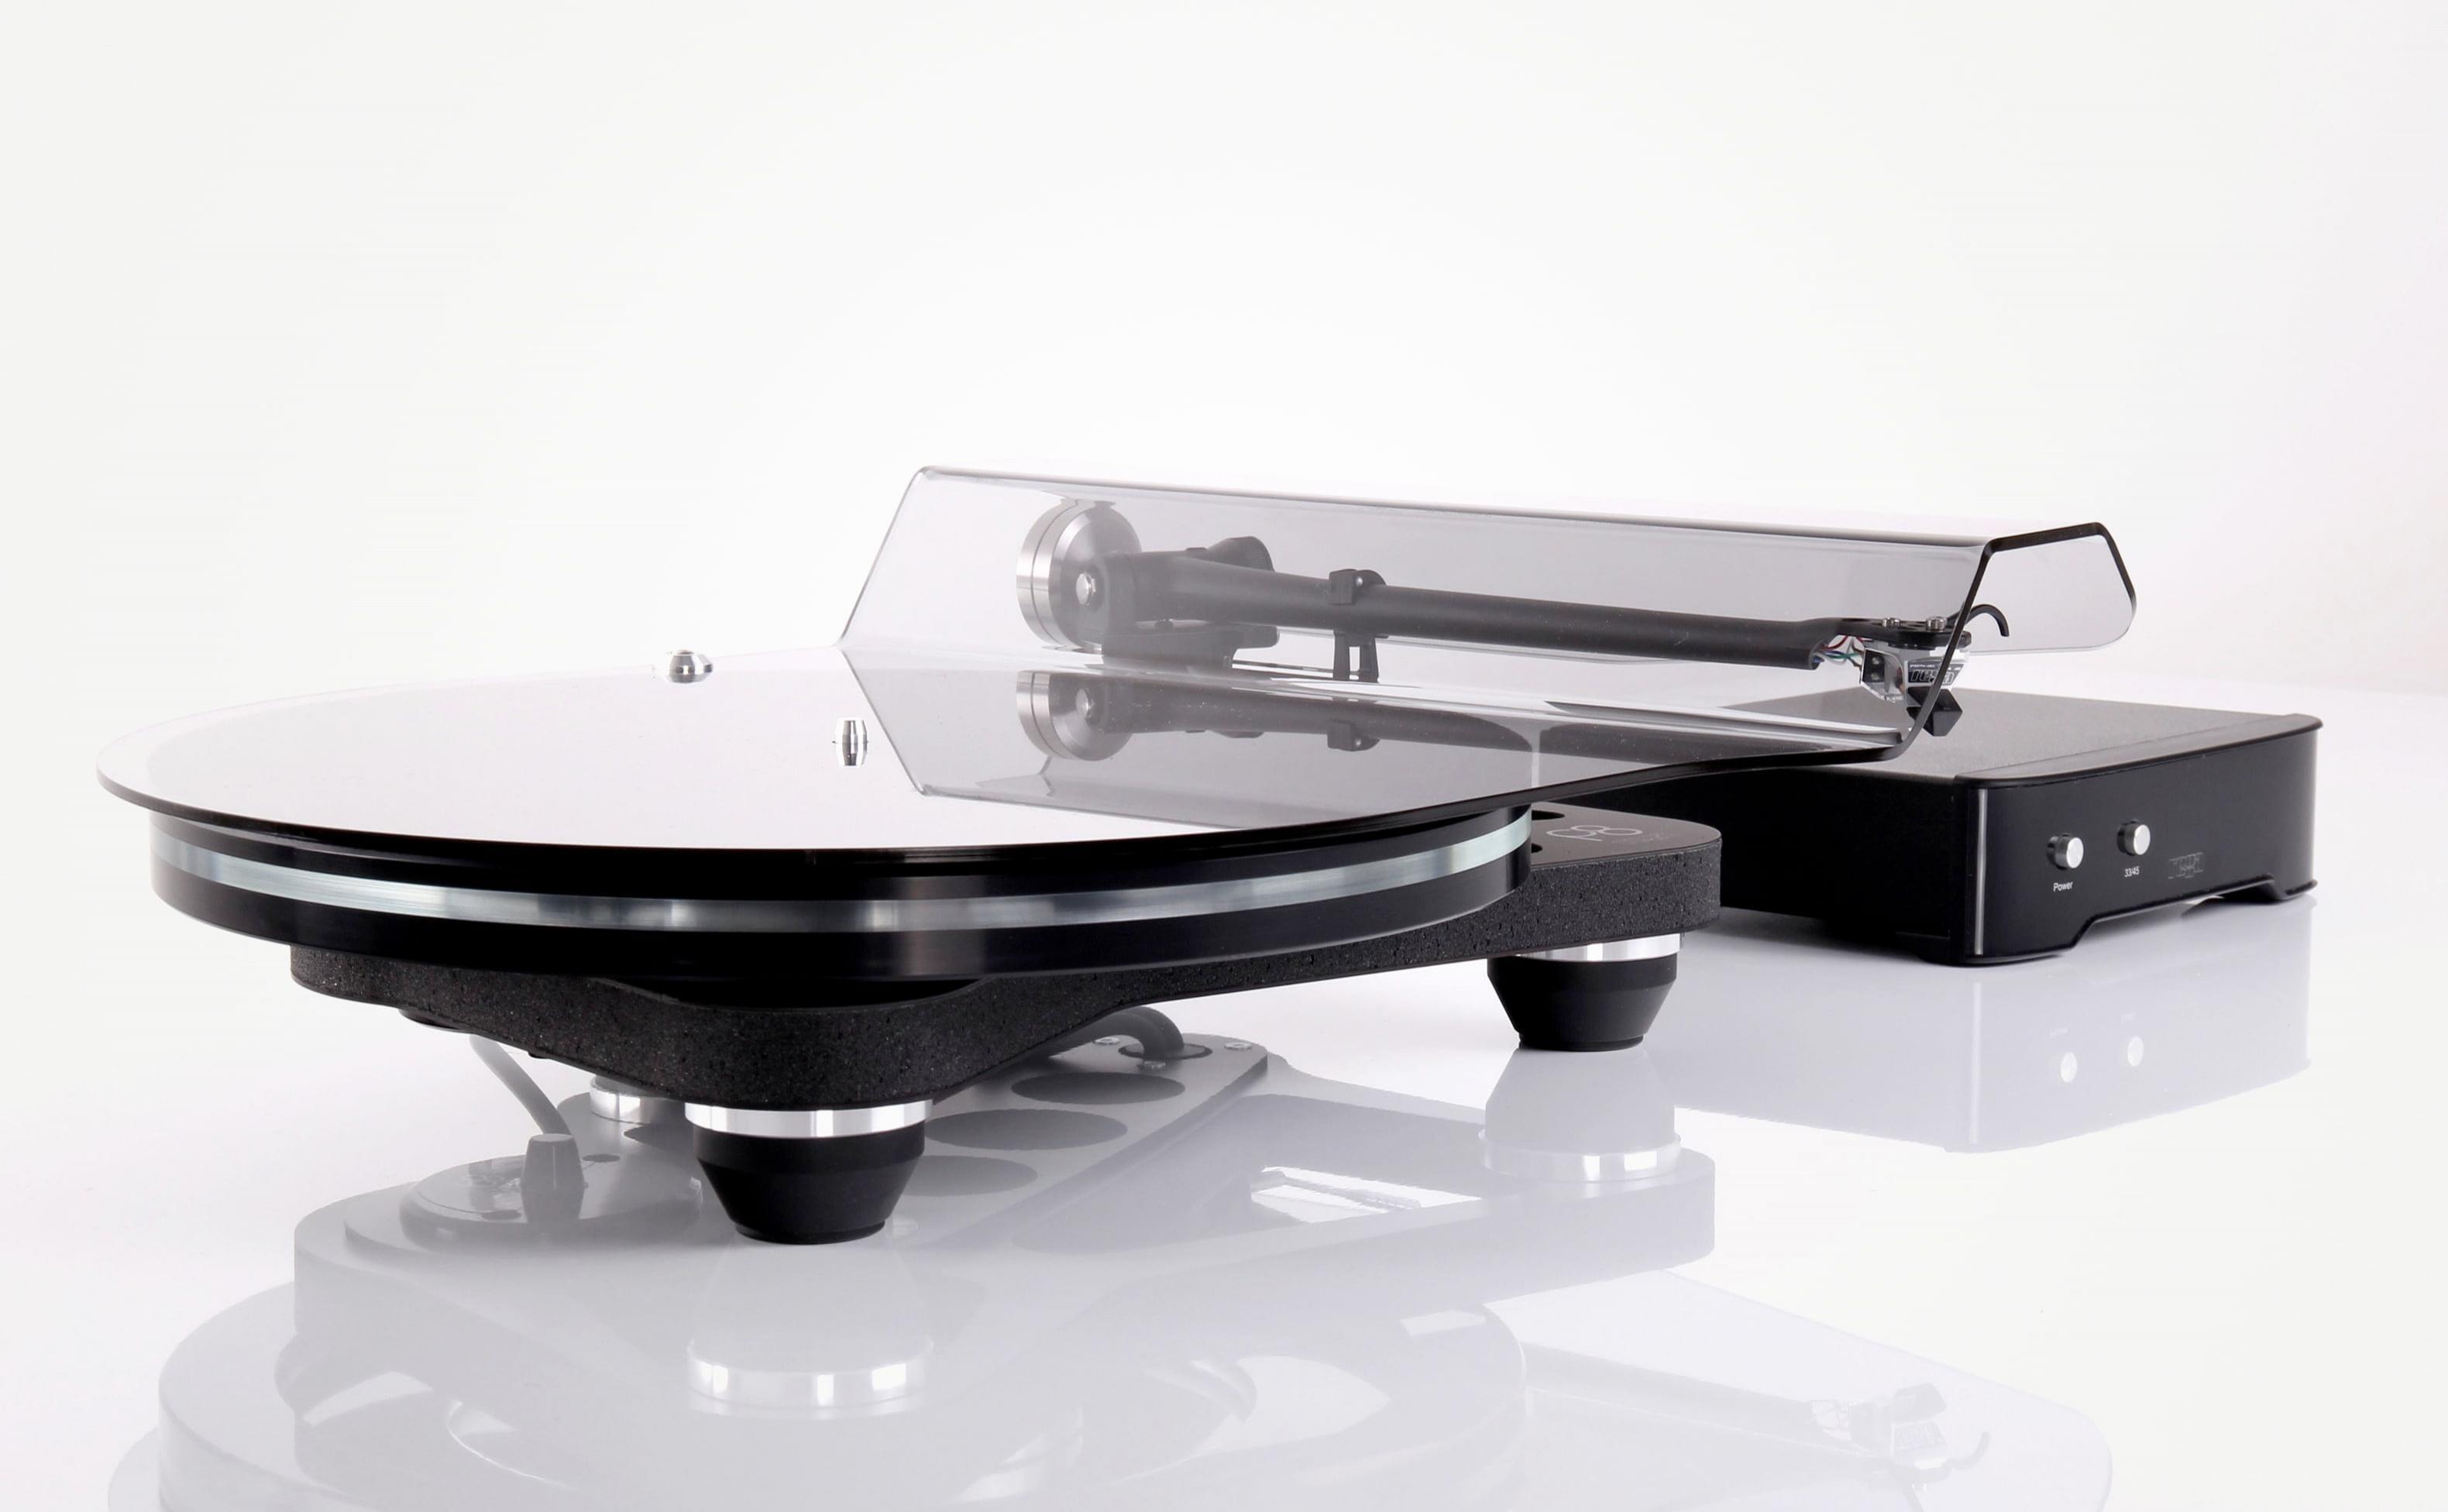 Rega Planar 8 + přenoska Nagaoka MP-110